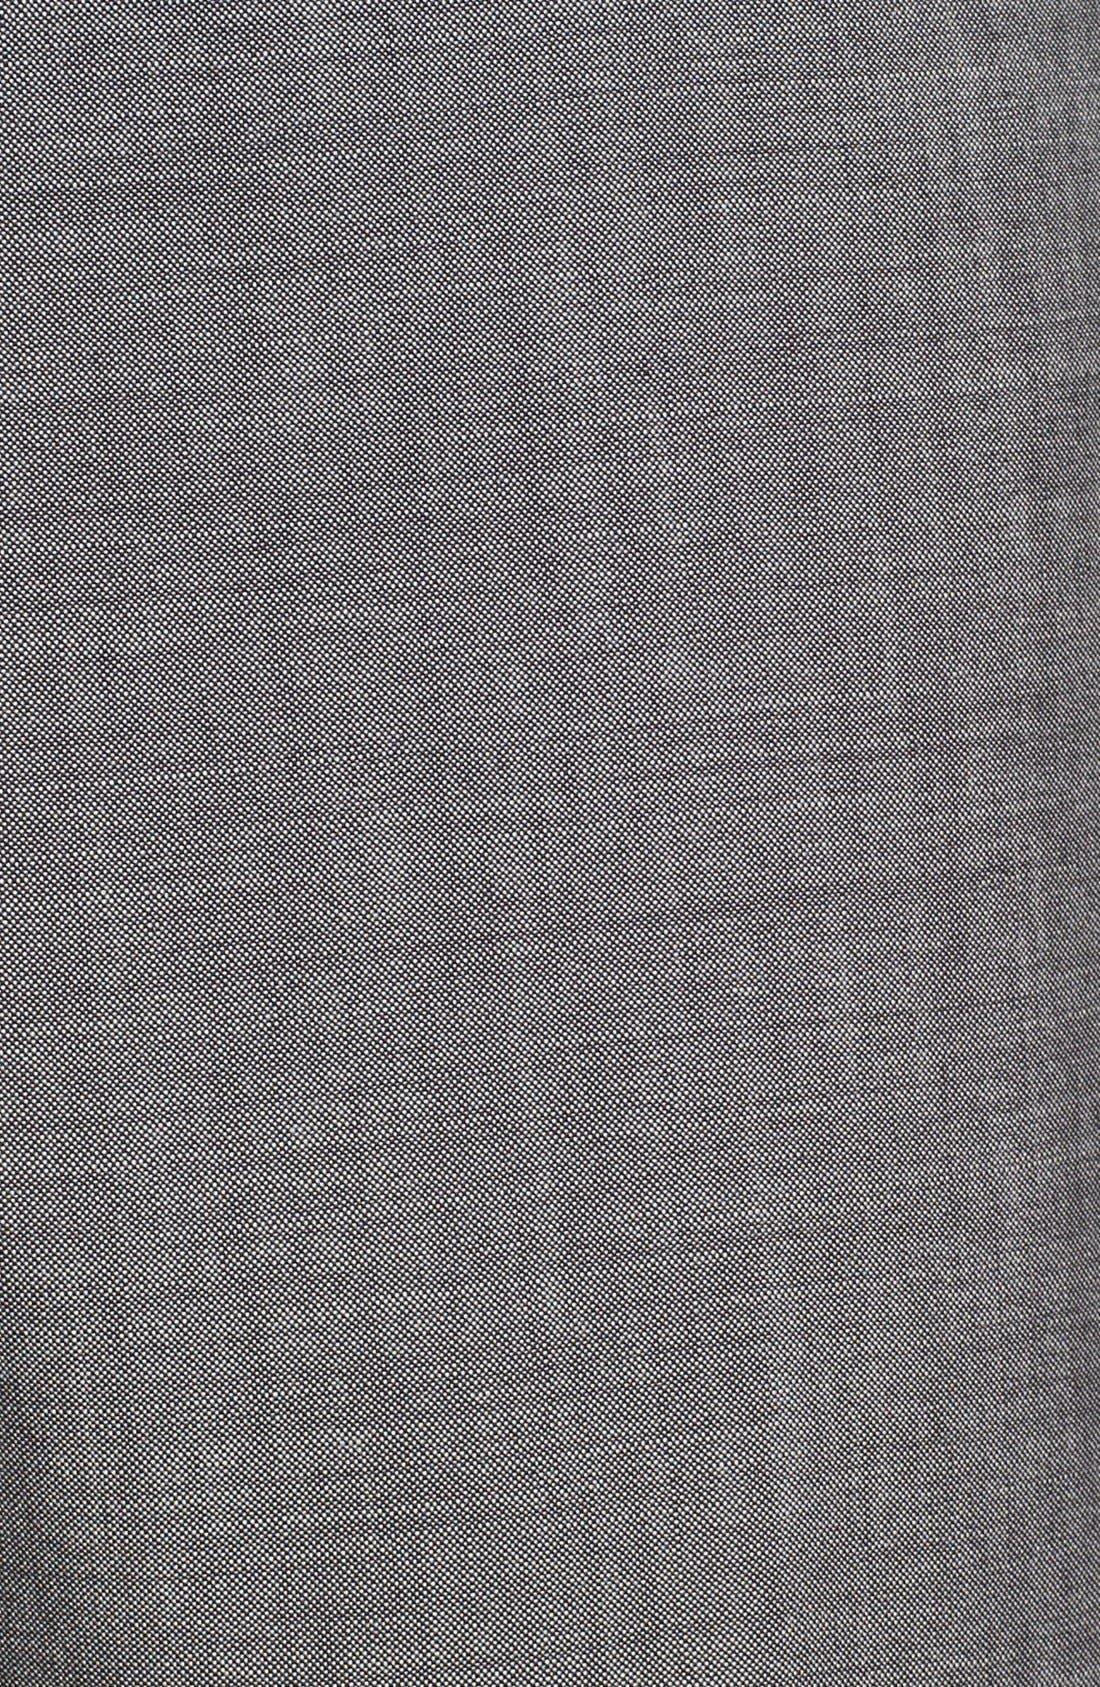 BOSS HUGO BOSS 'Jeffrey US' Flat Front Pinpoint Wool Trousers,                             Alternate thumbnail 2, color,                             022